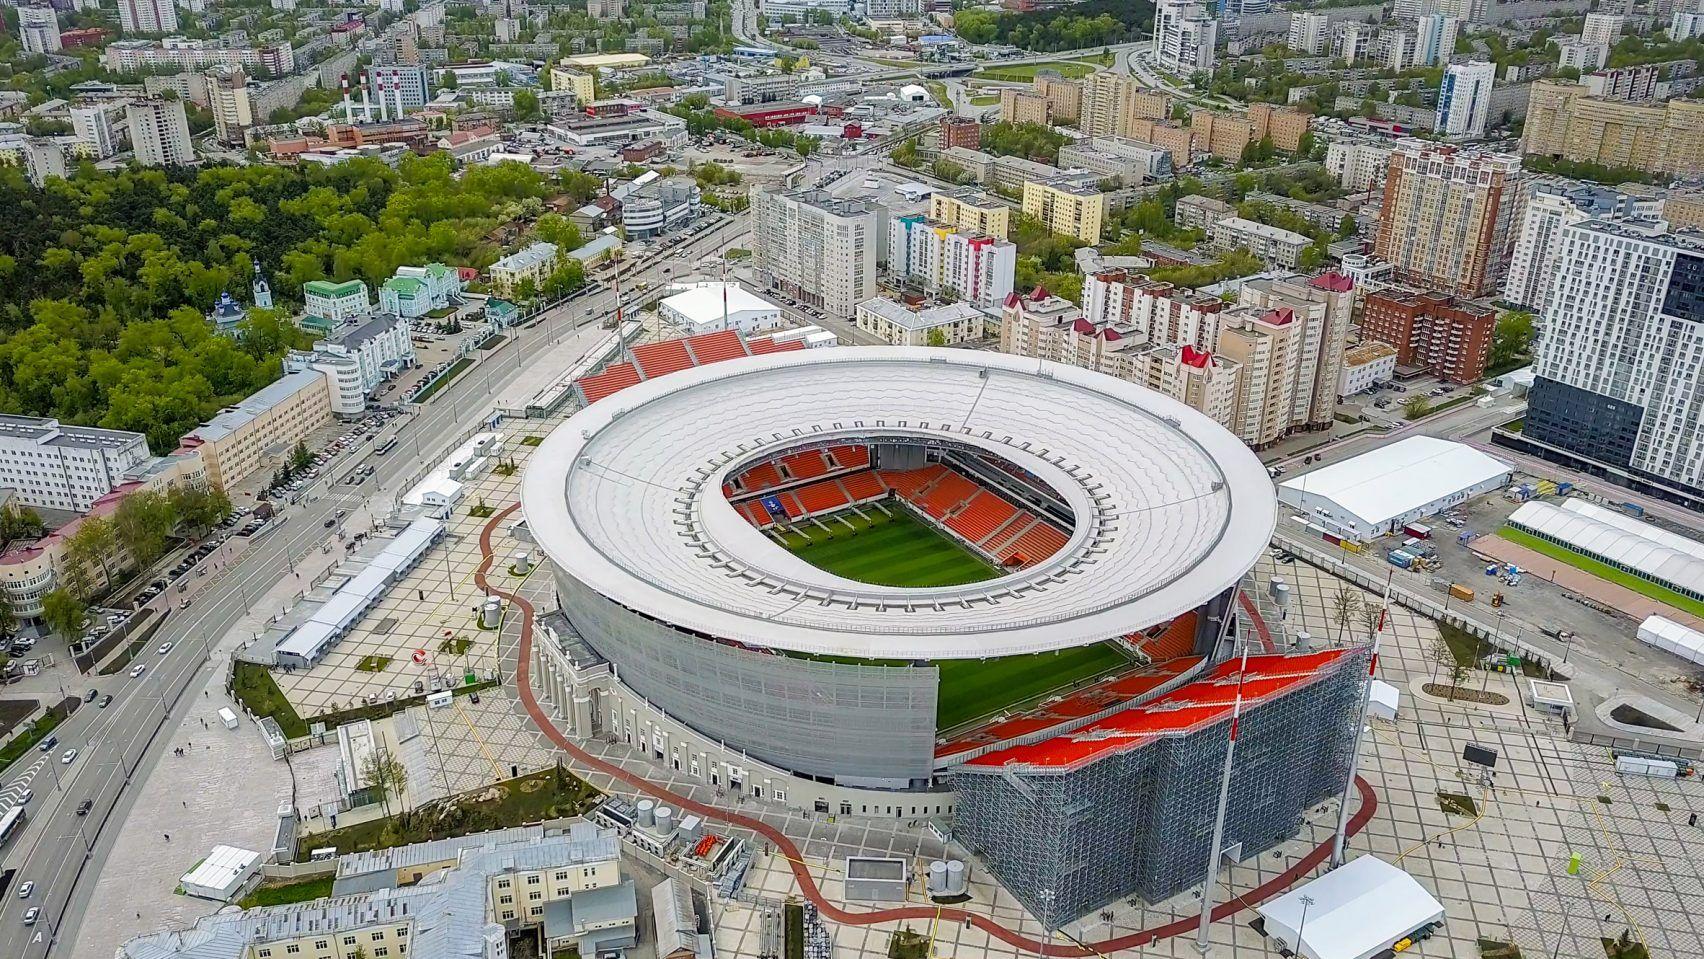 Ekaterinburg Arena Aka Central Stadium Ekaterinburg Russia World Cup Stadiums Stadium Stadium Design